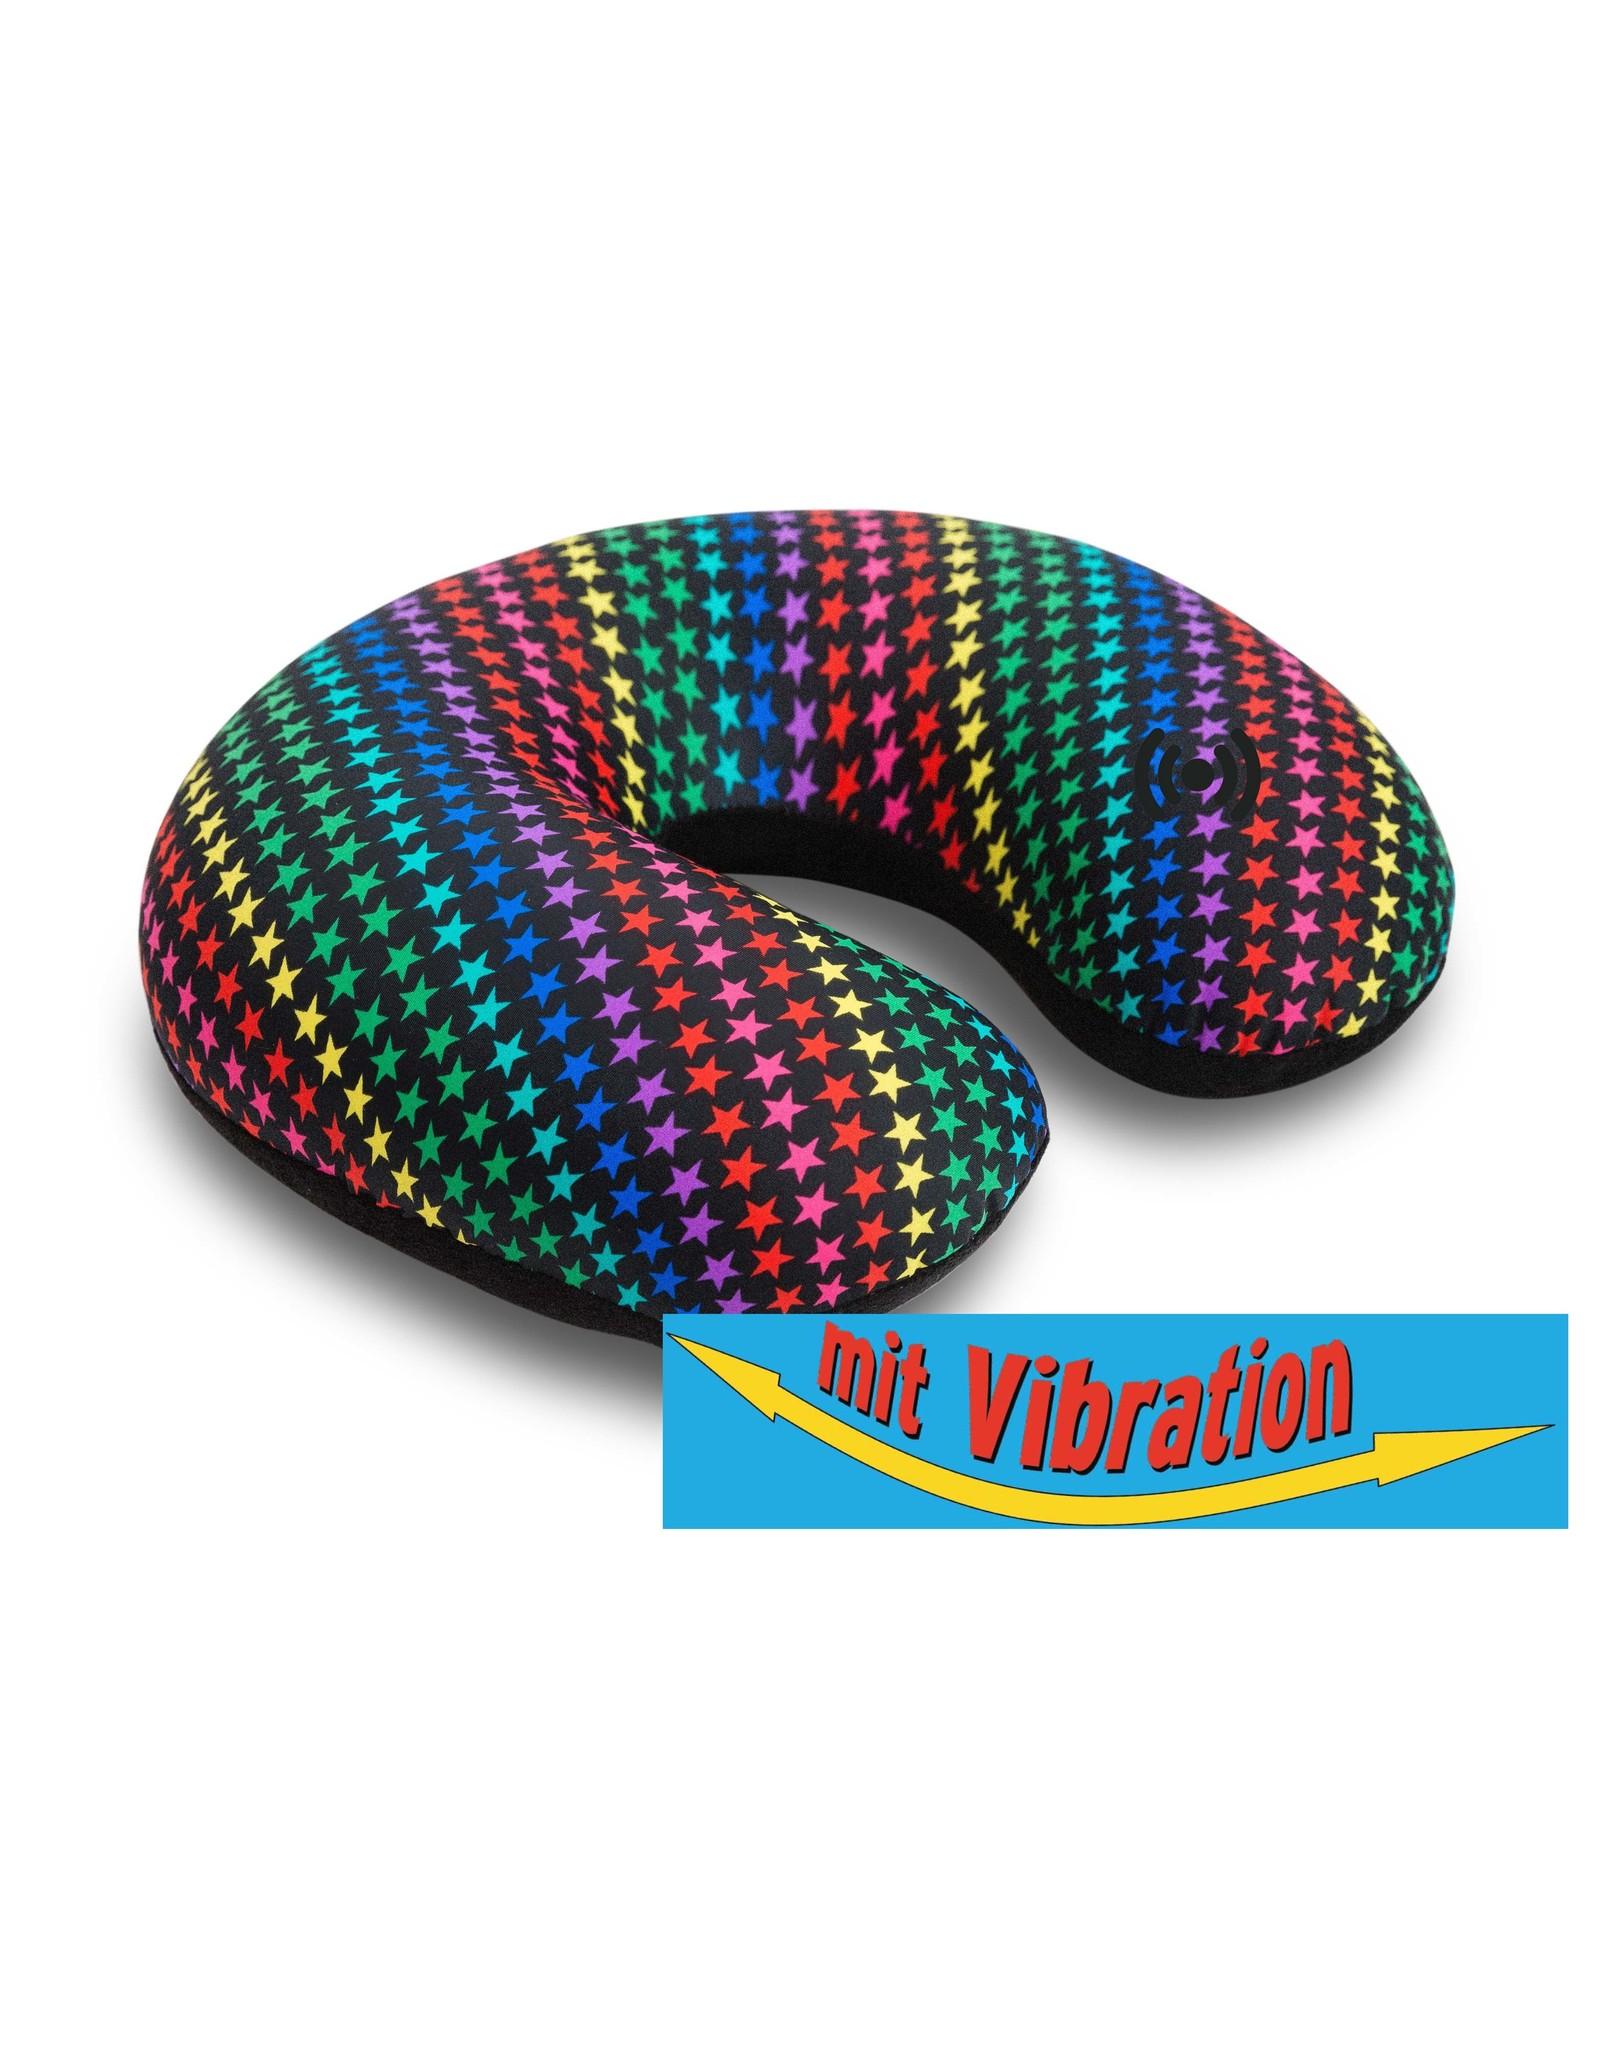 Kuschel-Maxx Kuschel-Maxx - Nack cushion Sterne - Vibration